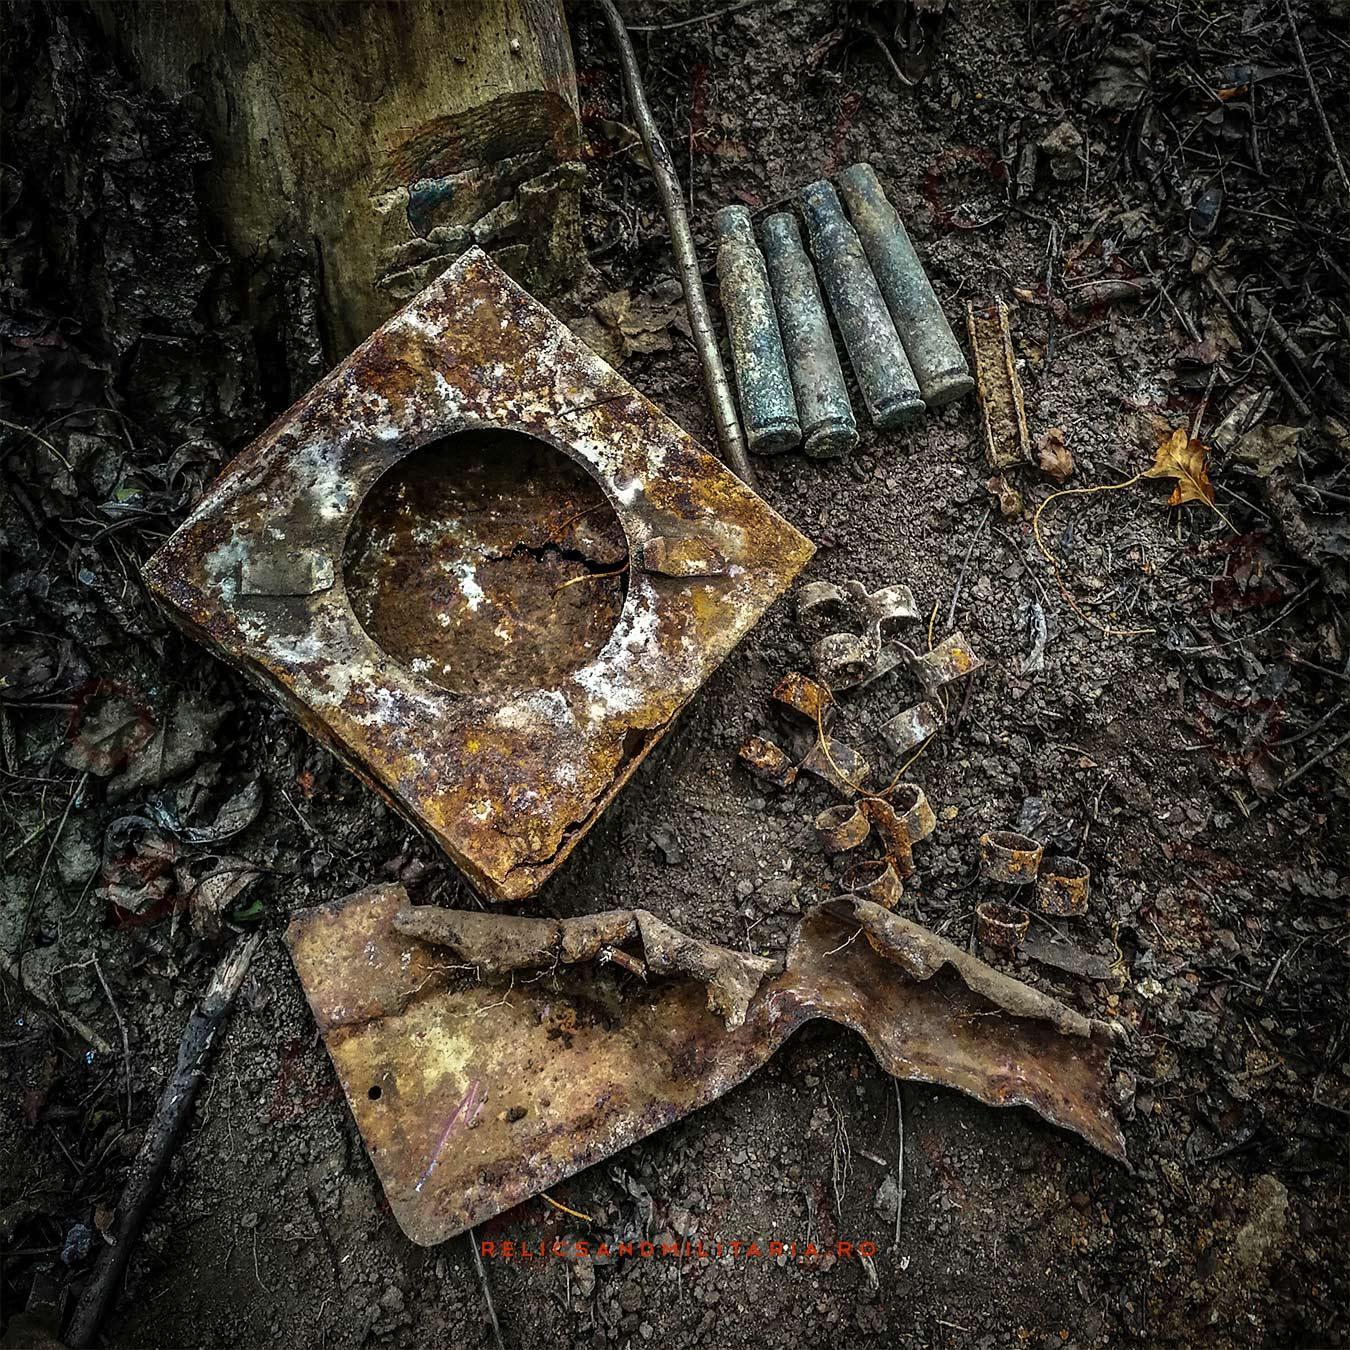 Metal detecting in Romania ww2 battlefields